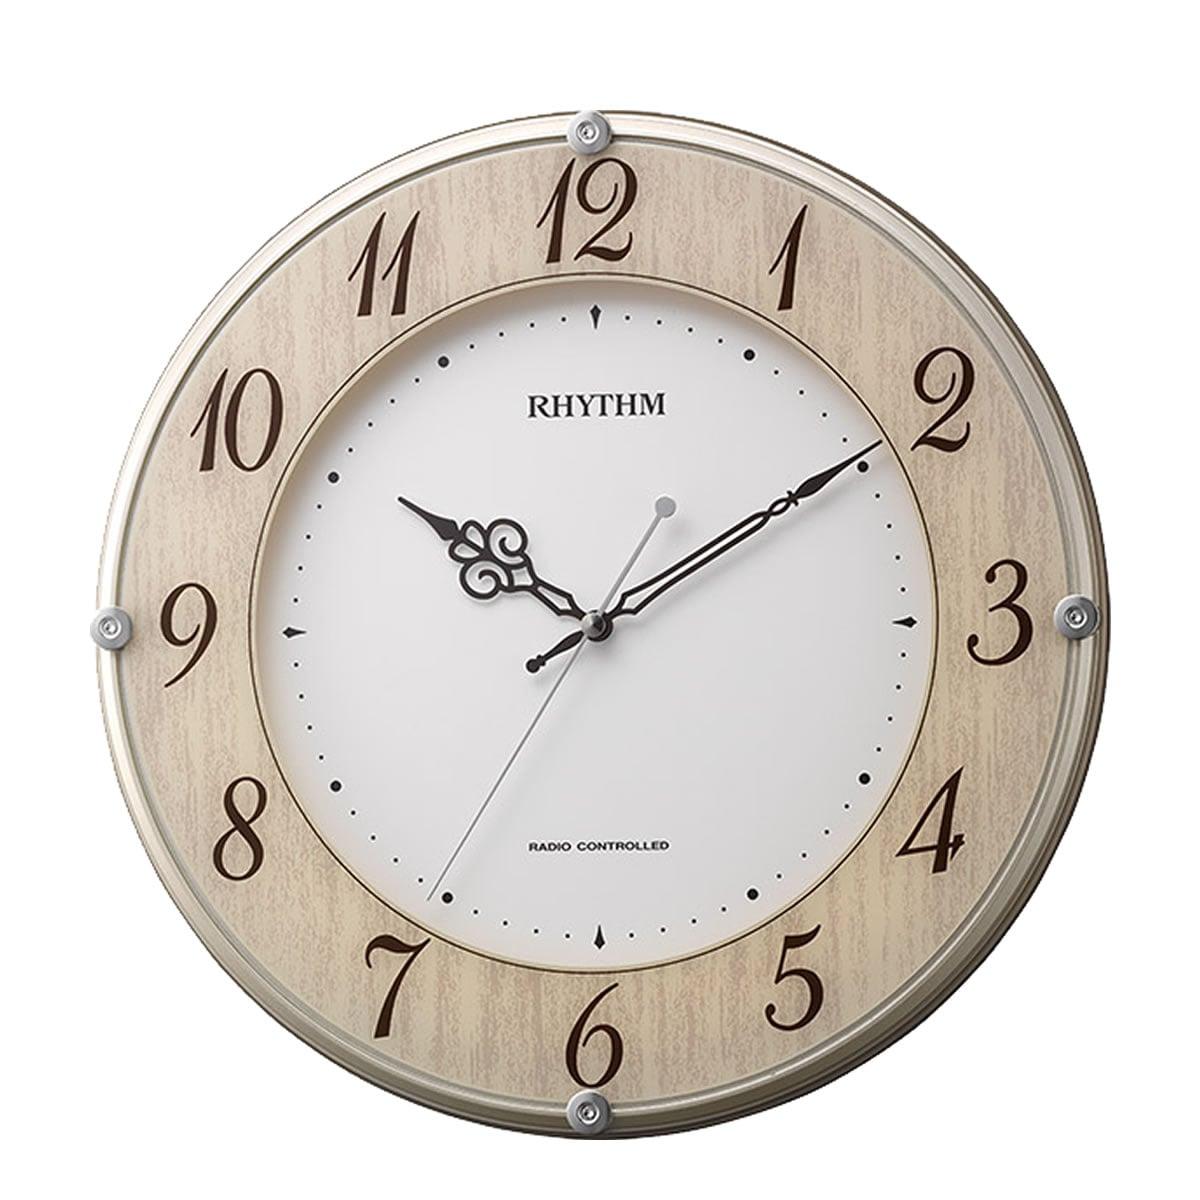 RHYTHM(リズム) 電波掛け時計 ライブリーナチュレ 8MY506SR23